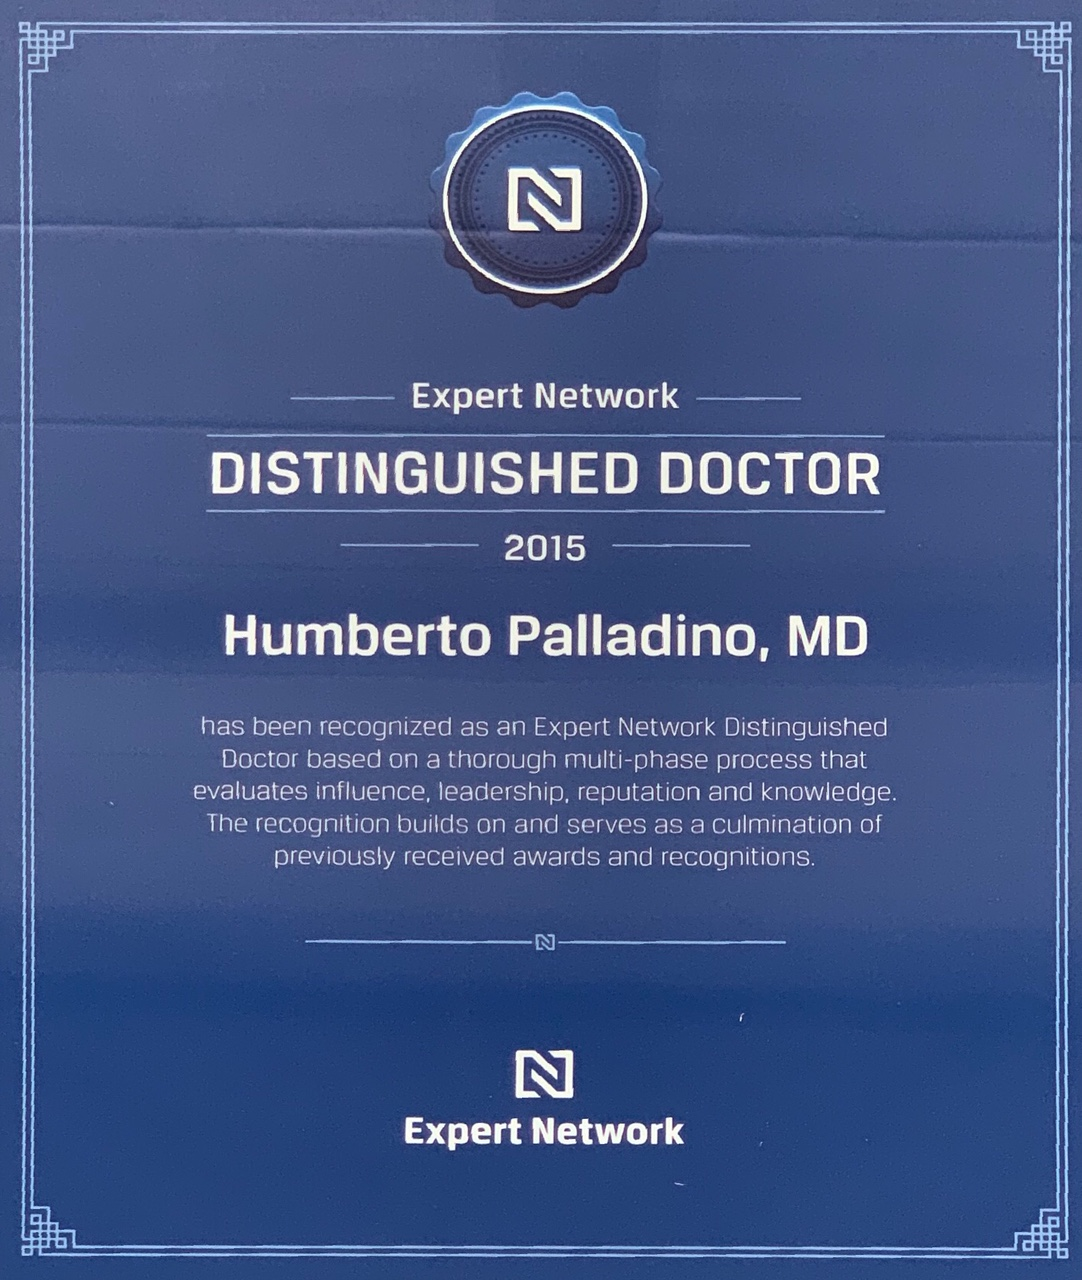 Expert Network Distinction